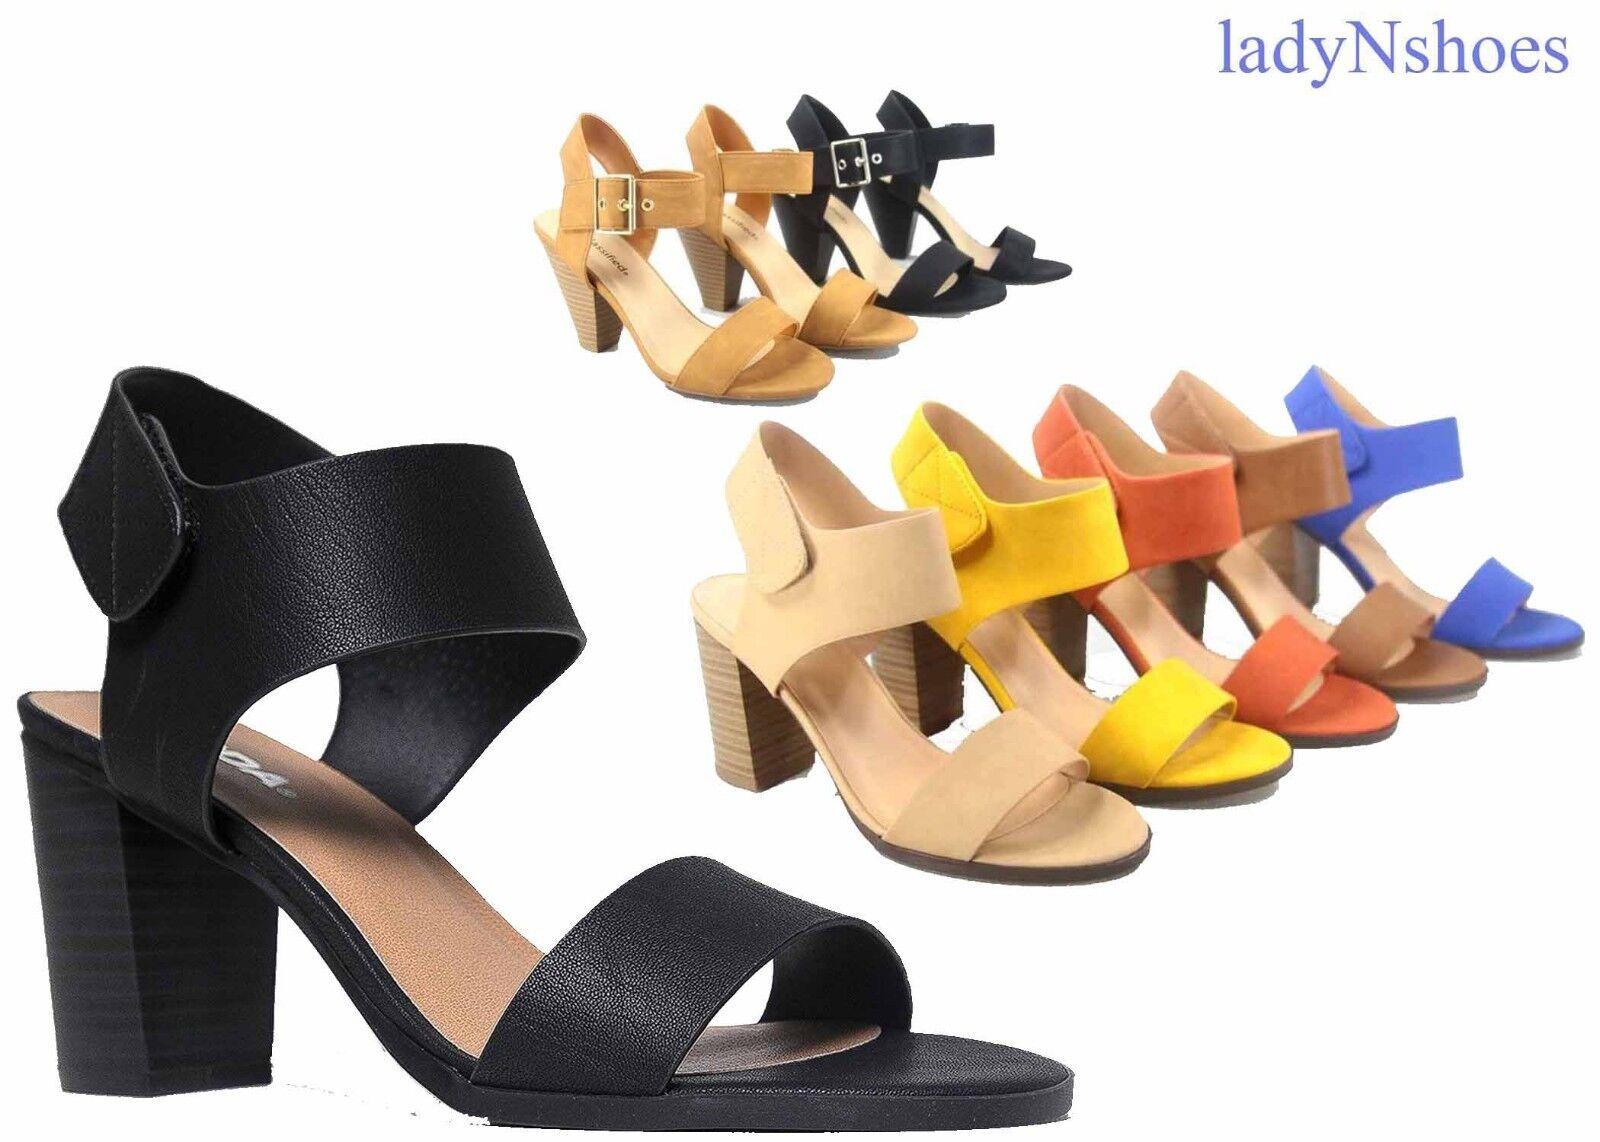 NEW Women's Open Toe Chunky Heel Ankle Strap Dress - Sandal Shoes Size 5.5 - Dress 11 6926b8